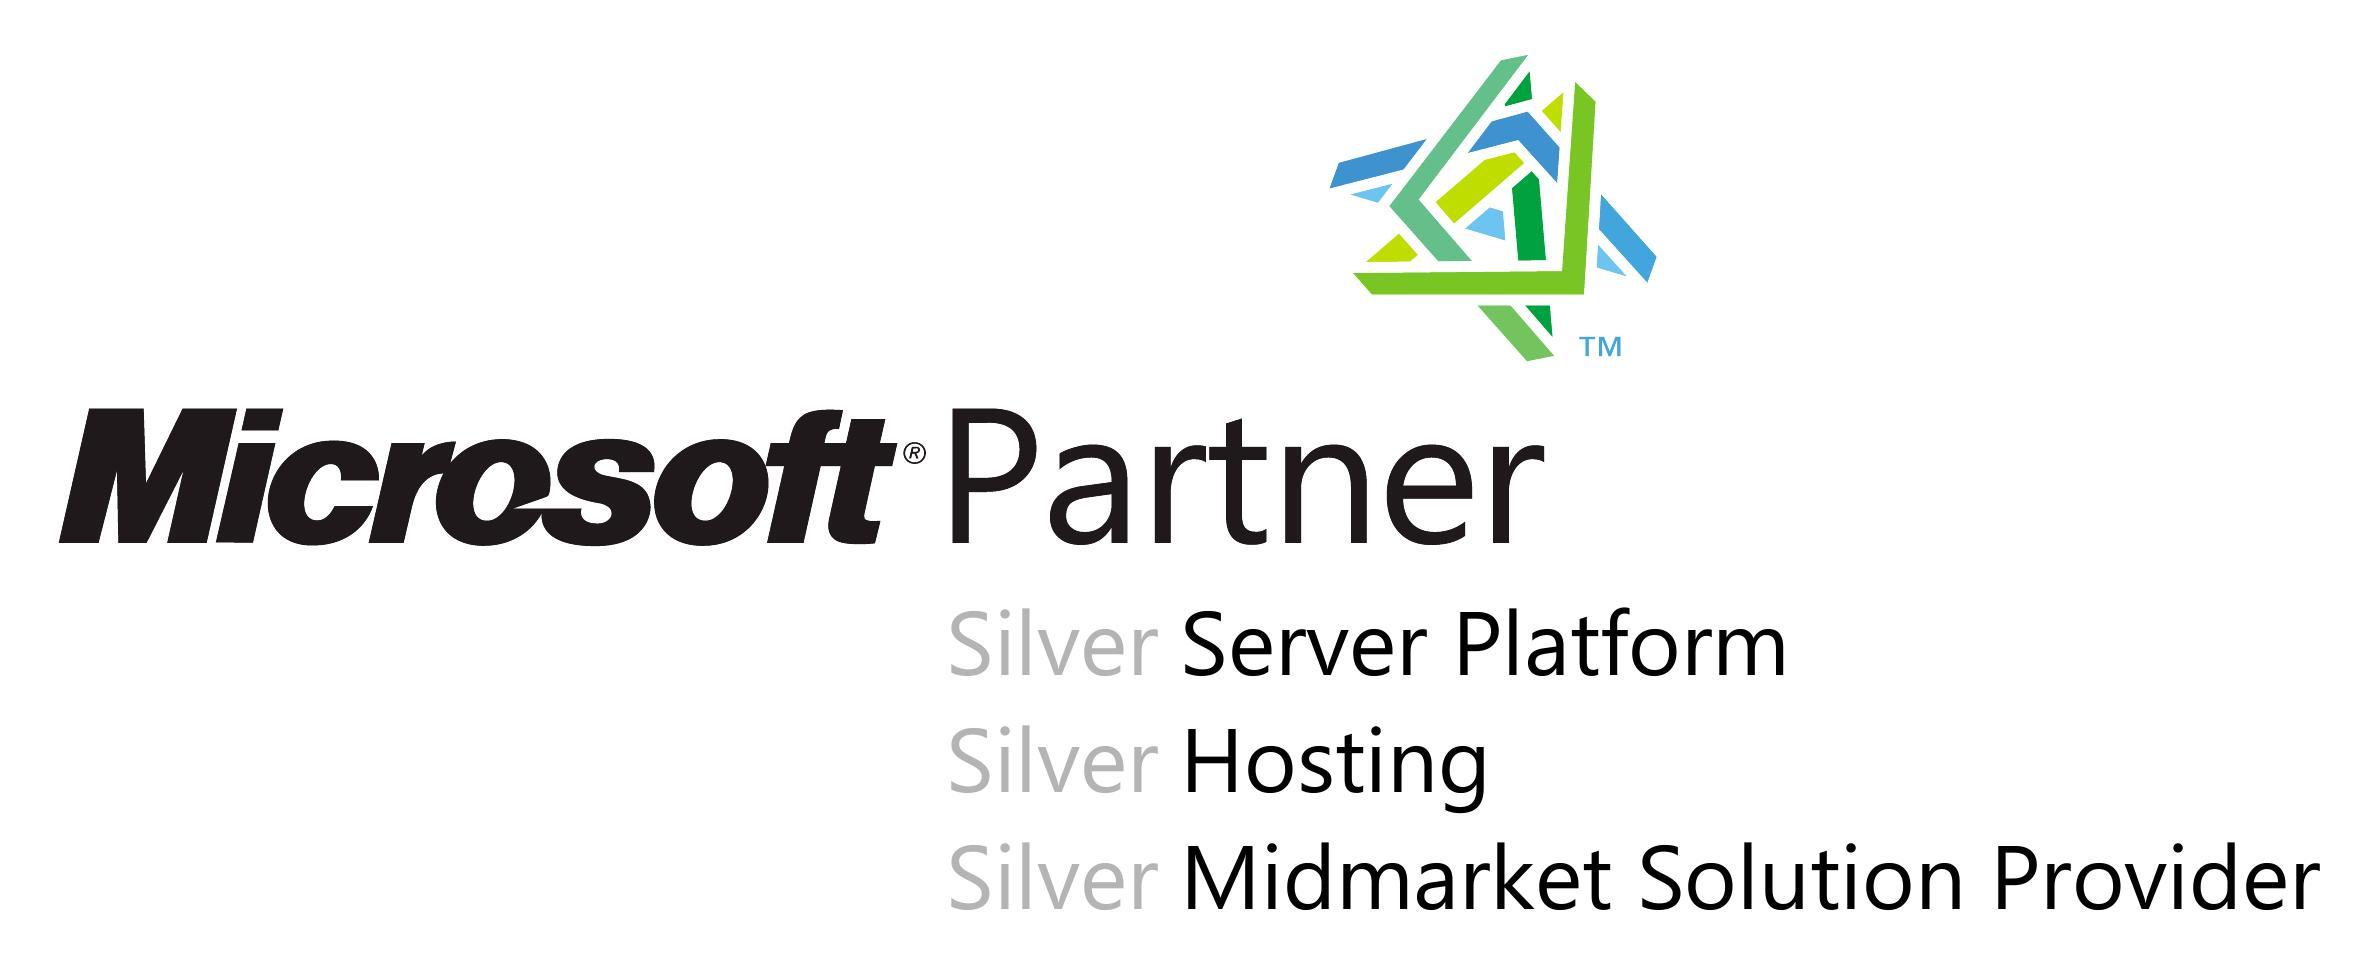 Windows XP Retirement: Essential Security Tips